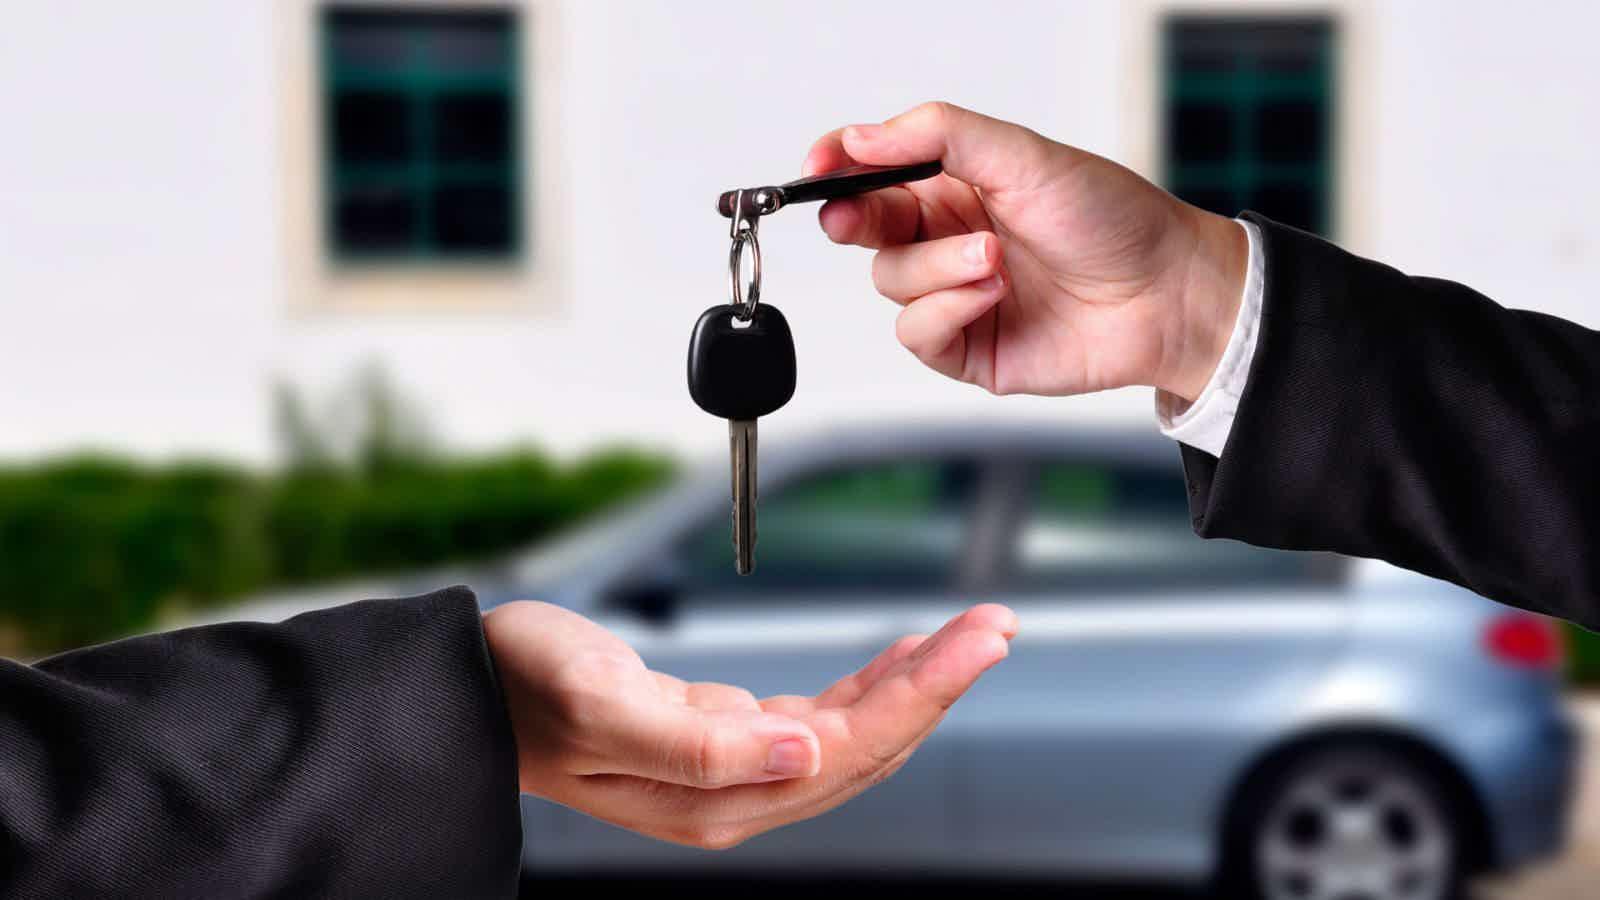 Empréstimo com garantia de veículo alienado